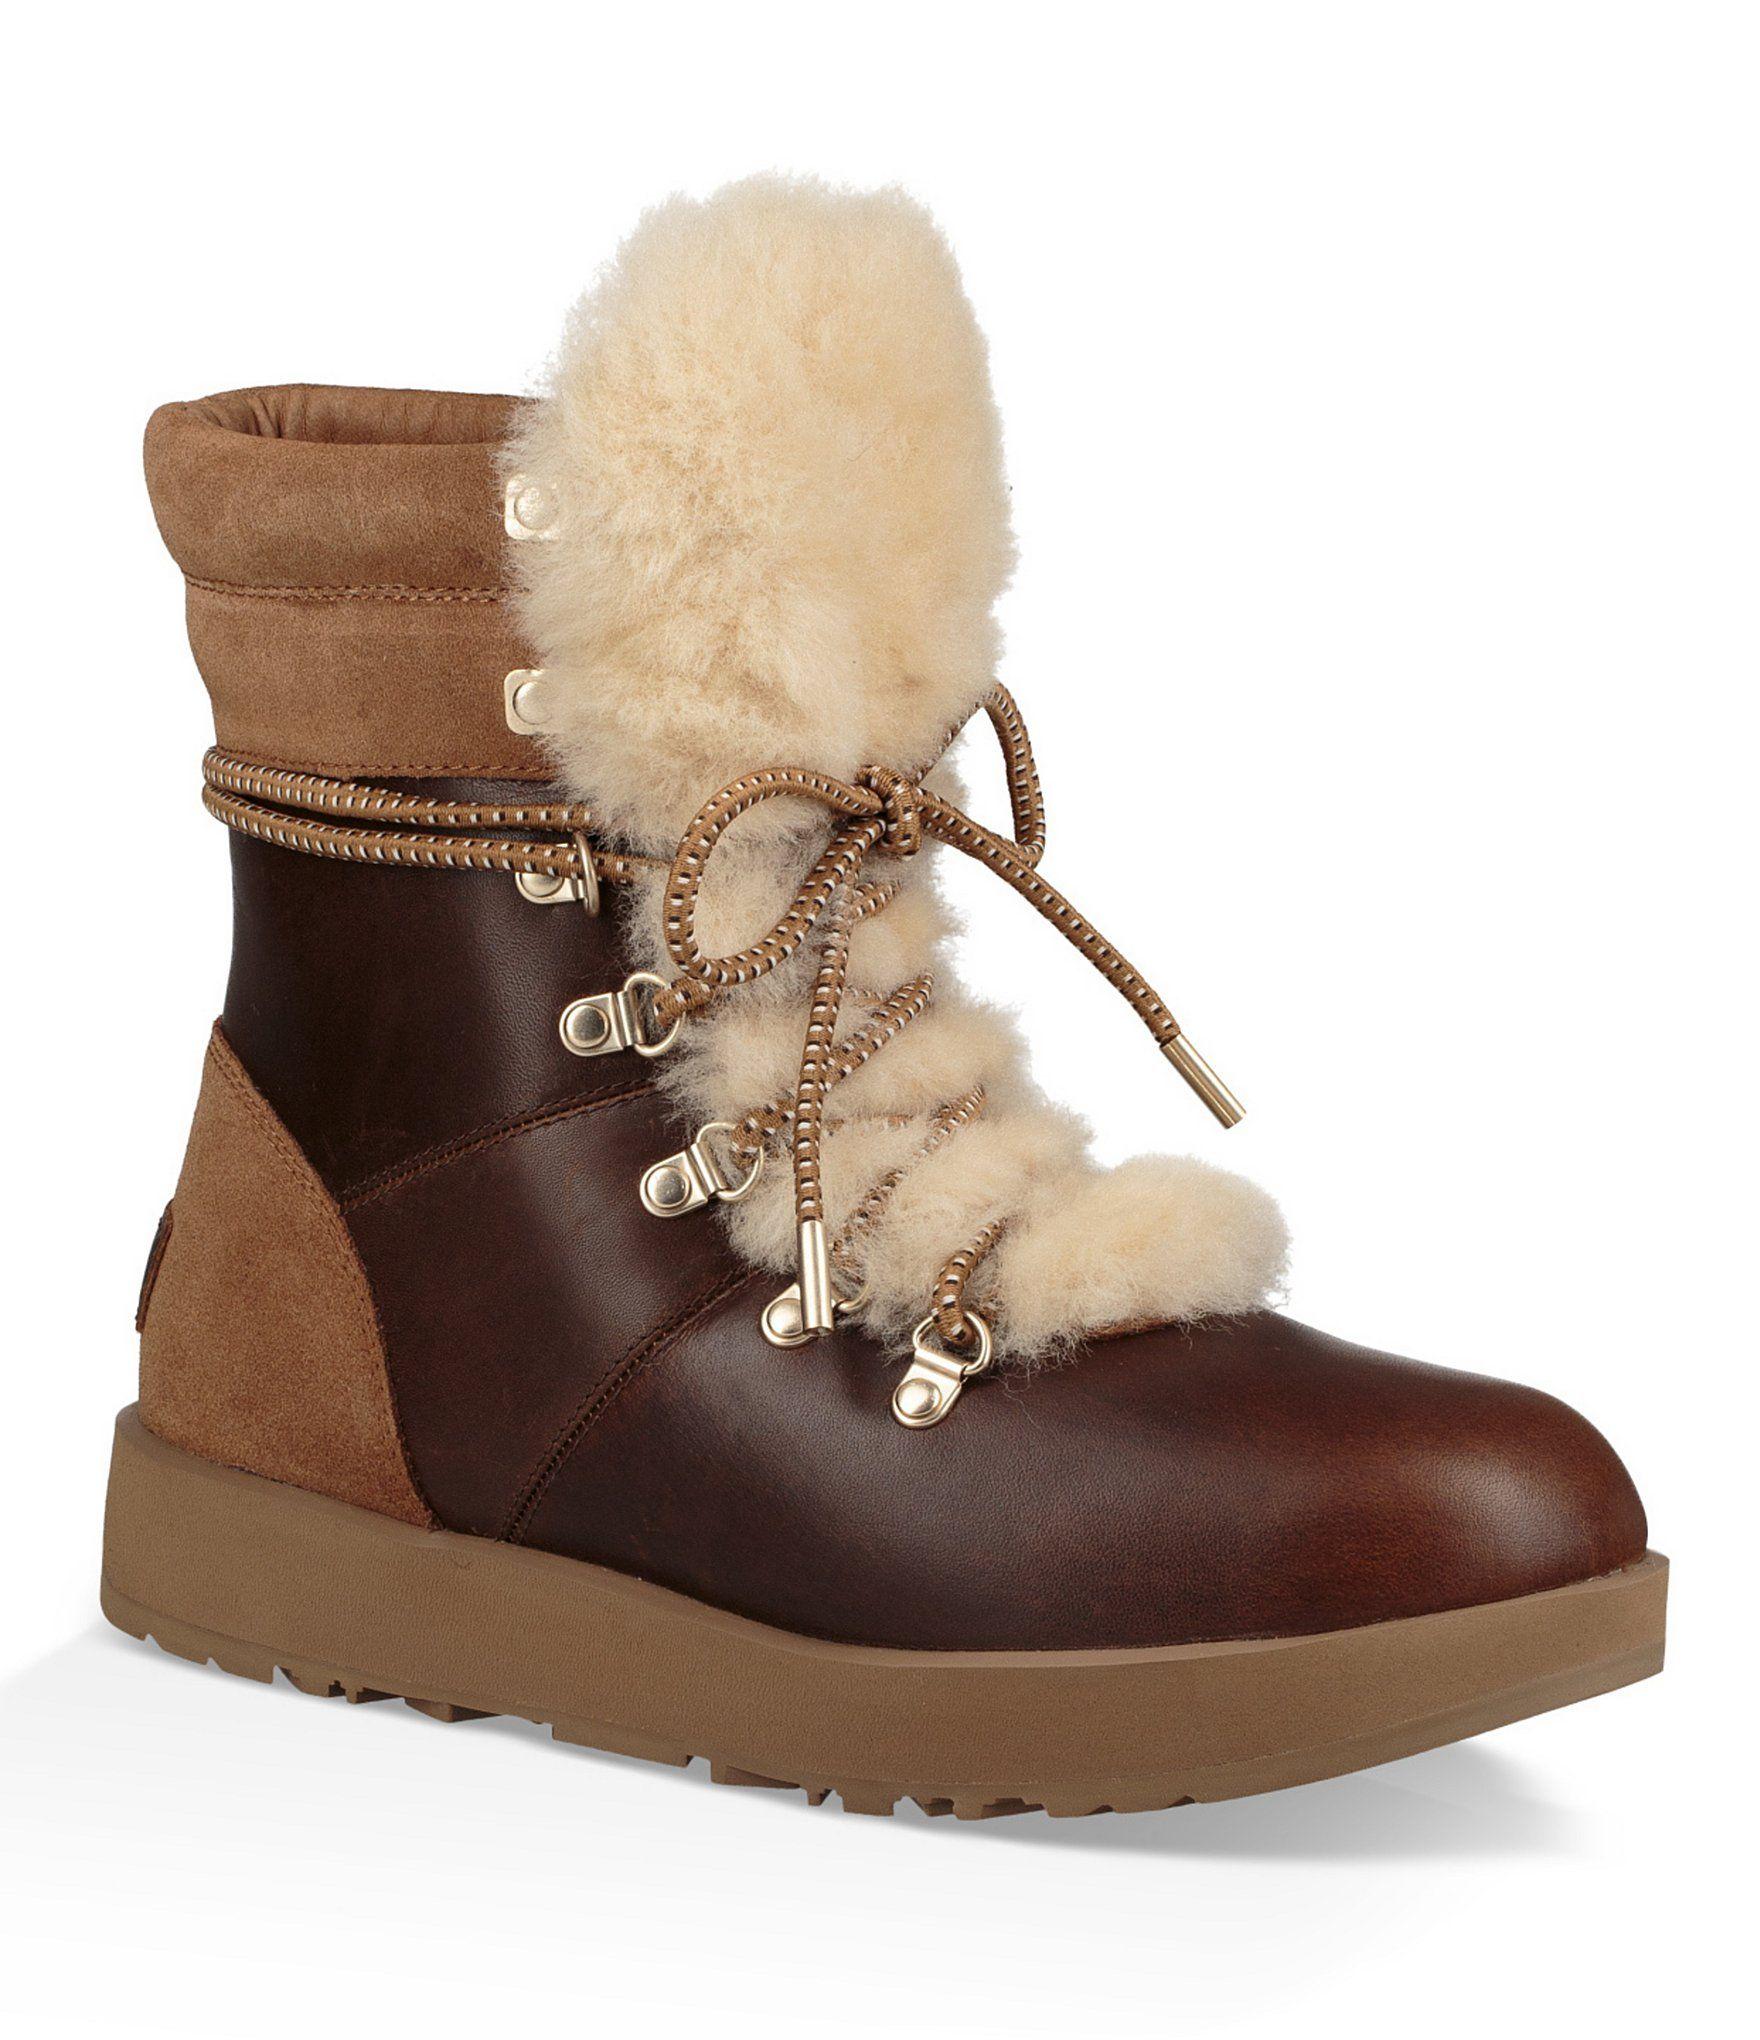 652db320d1d4b0 Shop for UGG® Viki Waterproof Lace Up Boots at Dillards.com. Visit Dillards